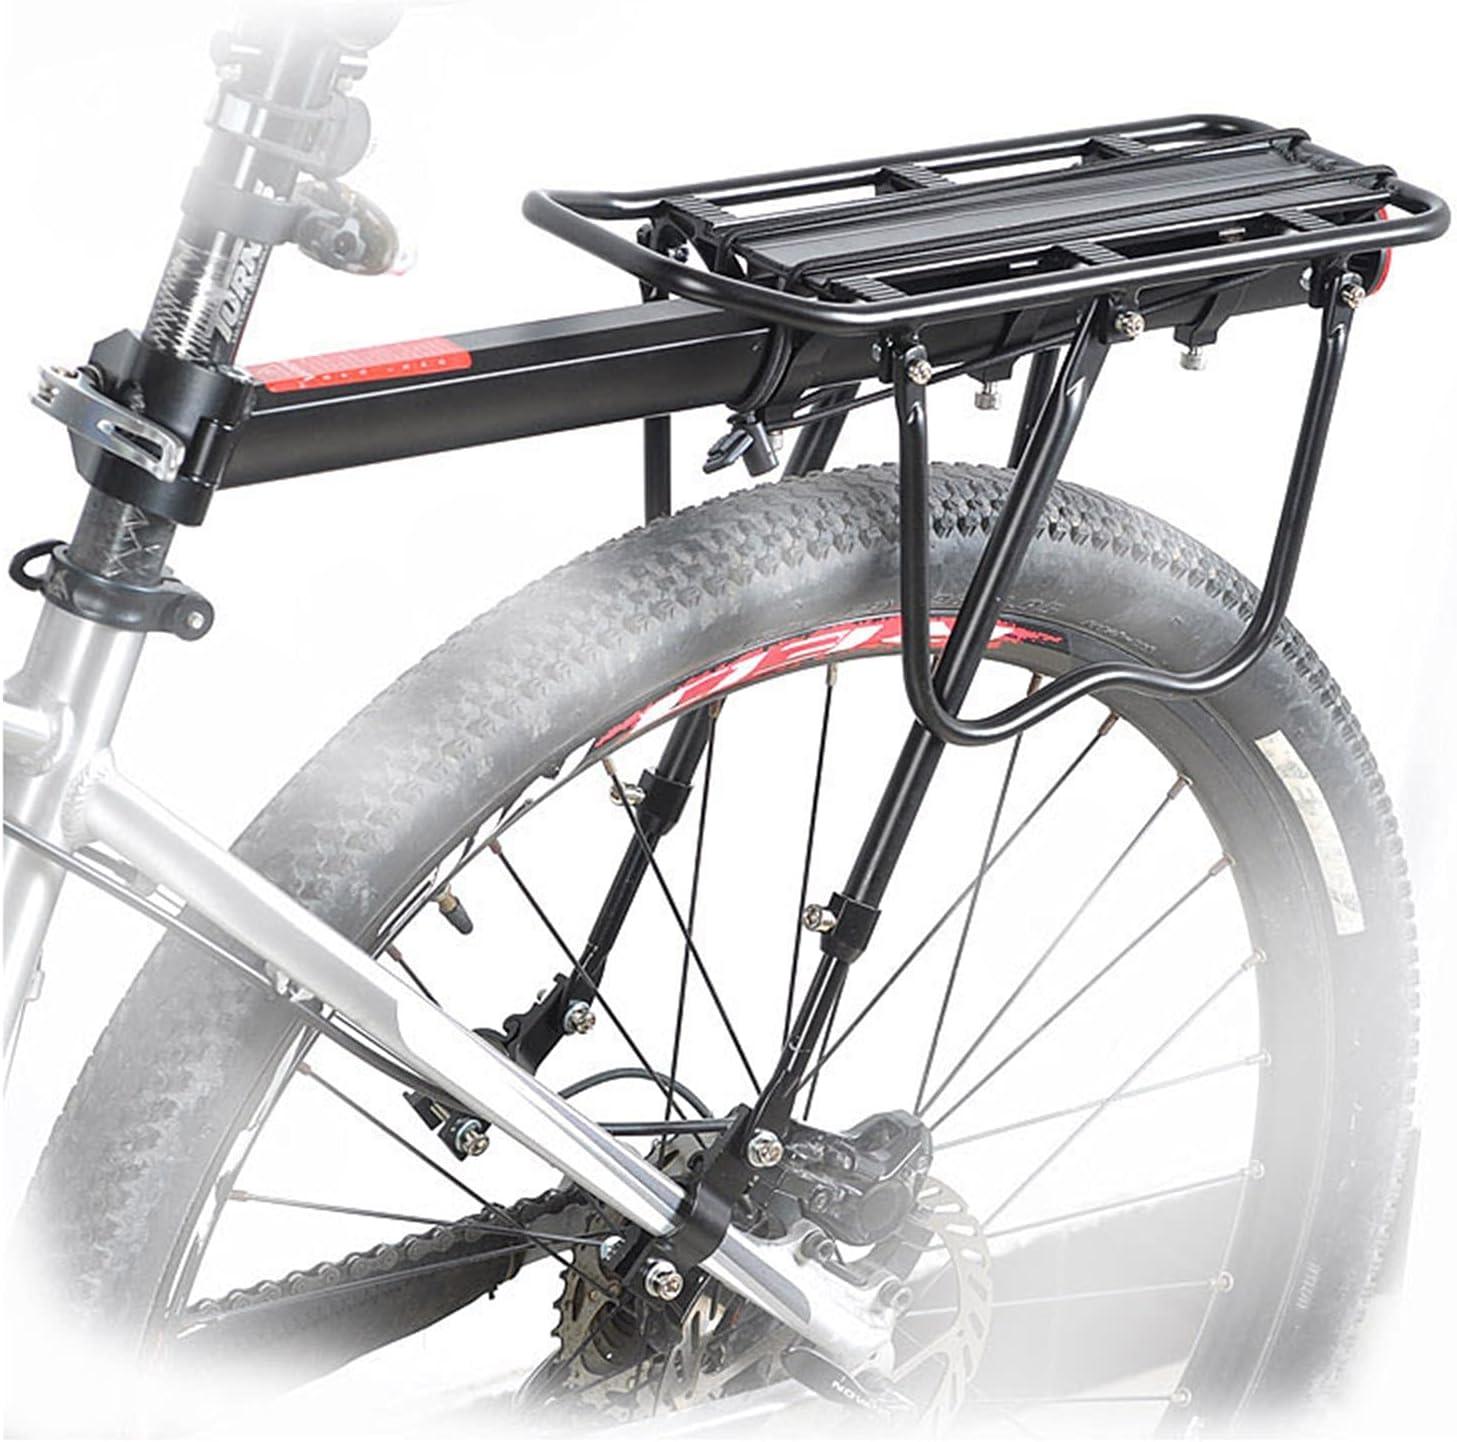 55% OFF Qikafan Bike Pannier Rack New sales Rear Adjustable Bicycle Carrier